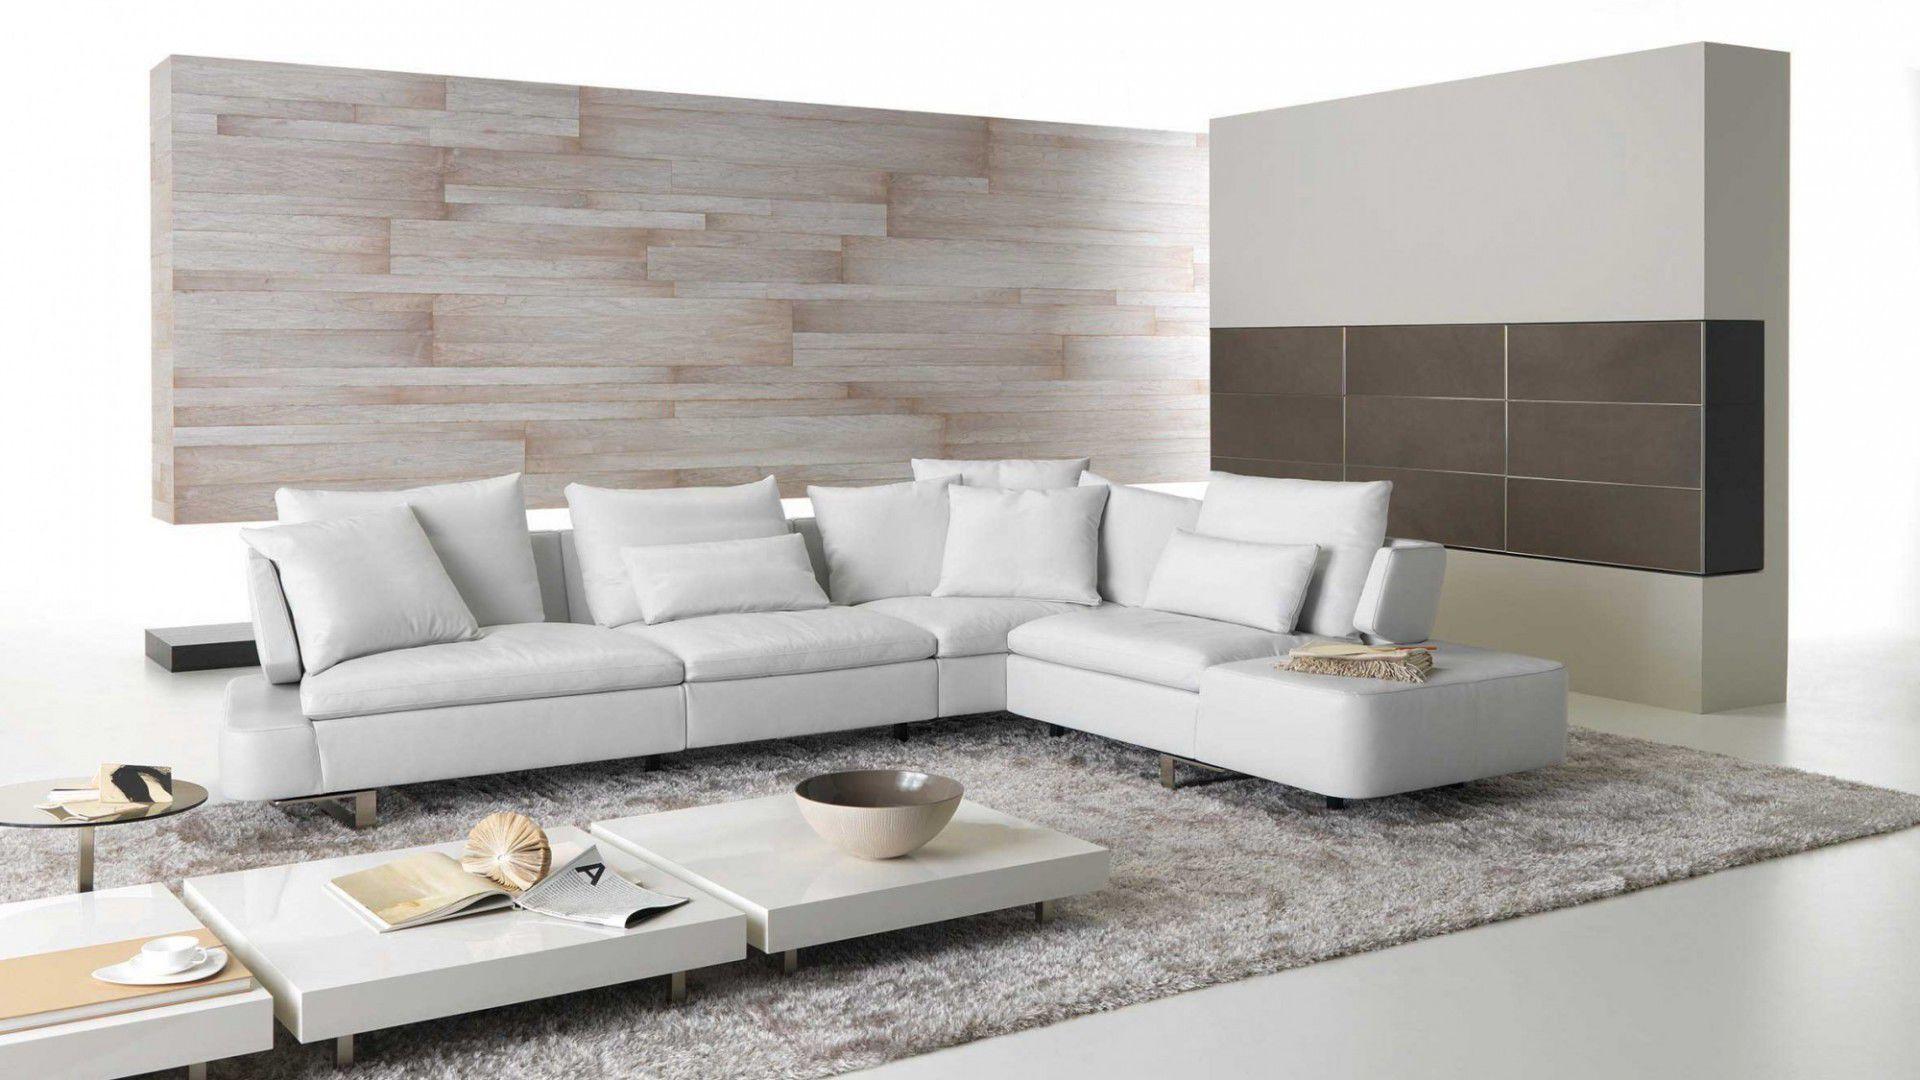 Swell Modular Sofa Contemporary Leather Fabric Opus Natuzzi Alphanode Cool Chair Designs And Ideas Alphanodeonline